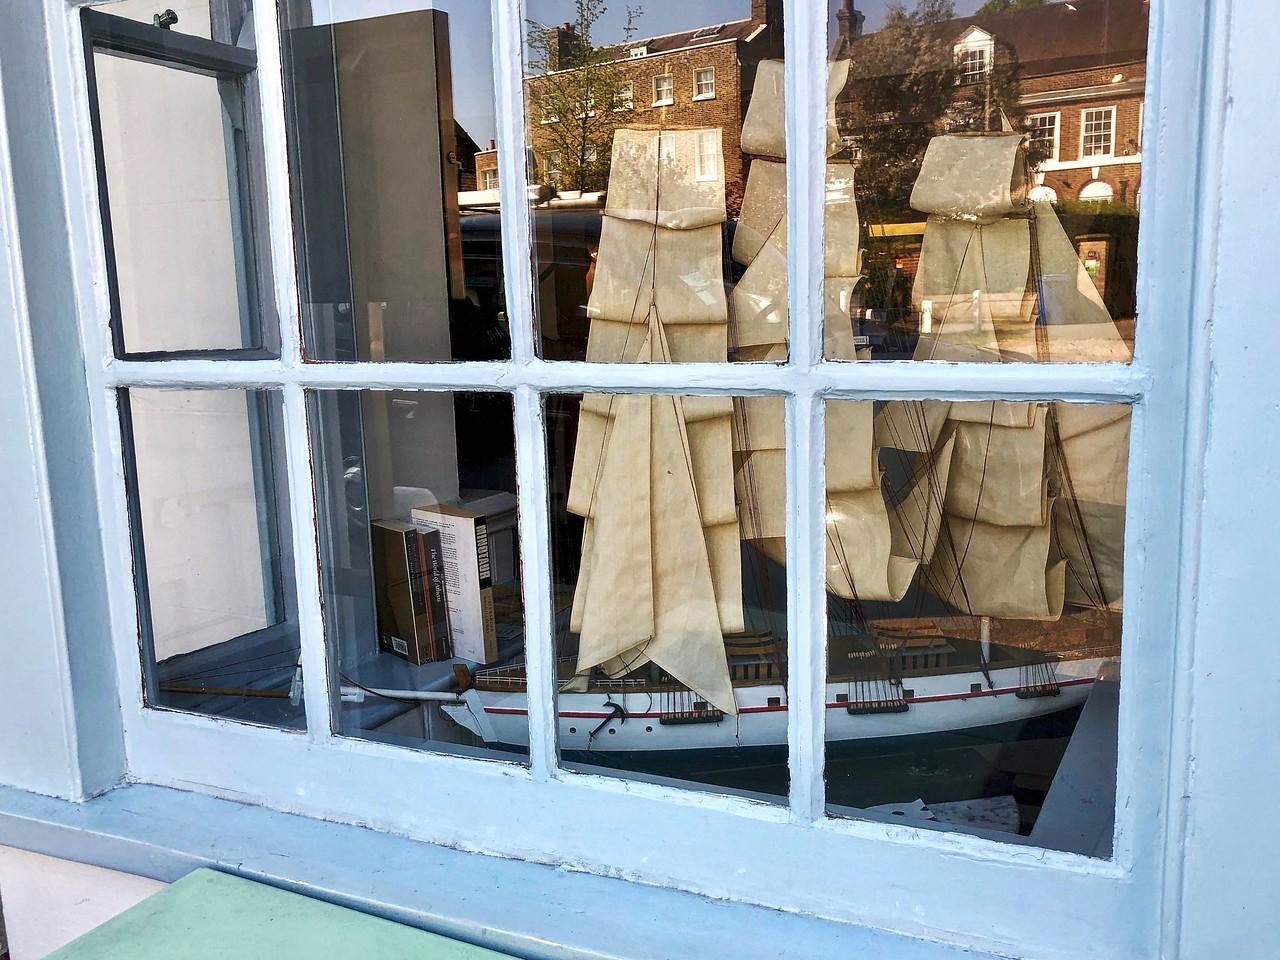 Sailing ship model in a restaurant window in Dulwich Village